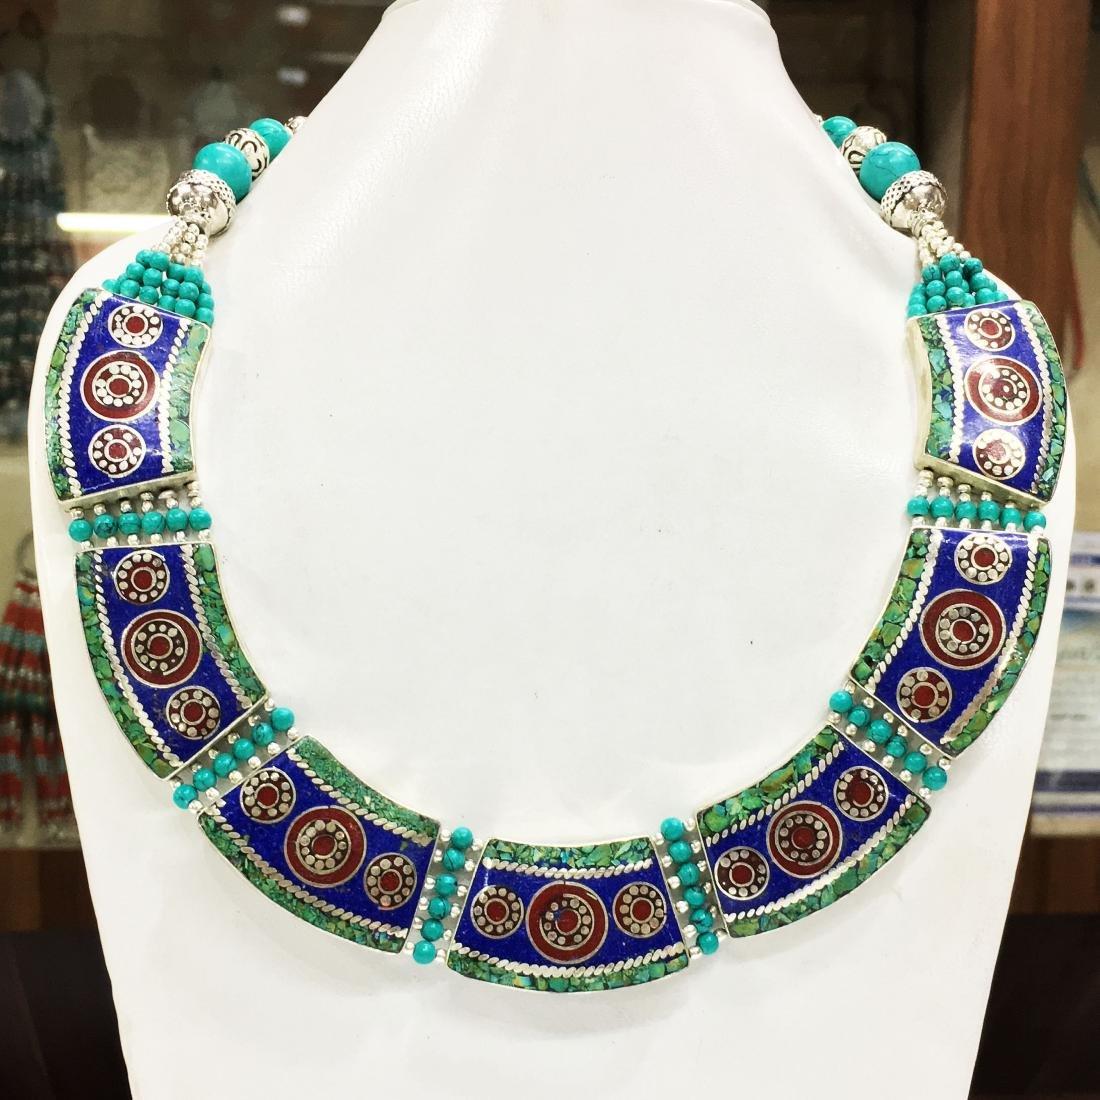 Tourmaline quartz Silver handmade butterfly Necklace